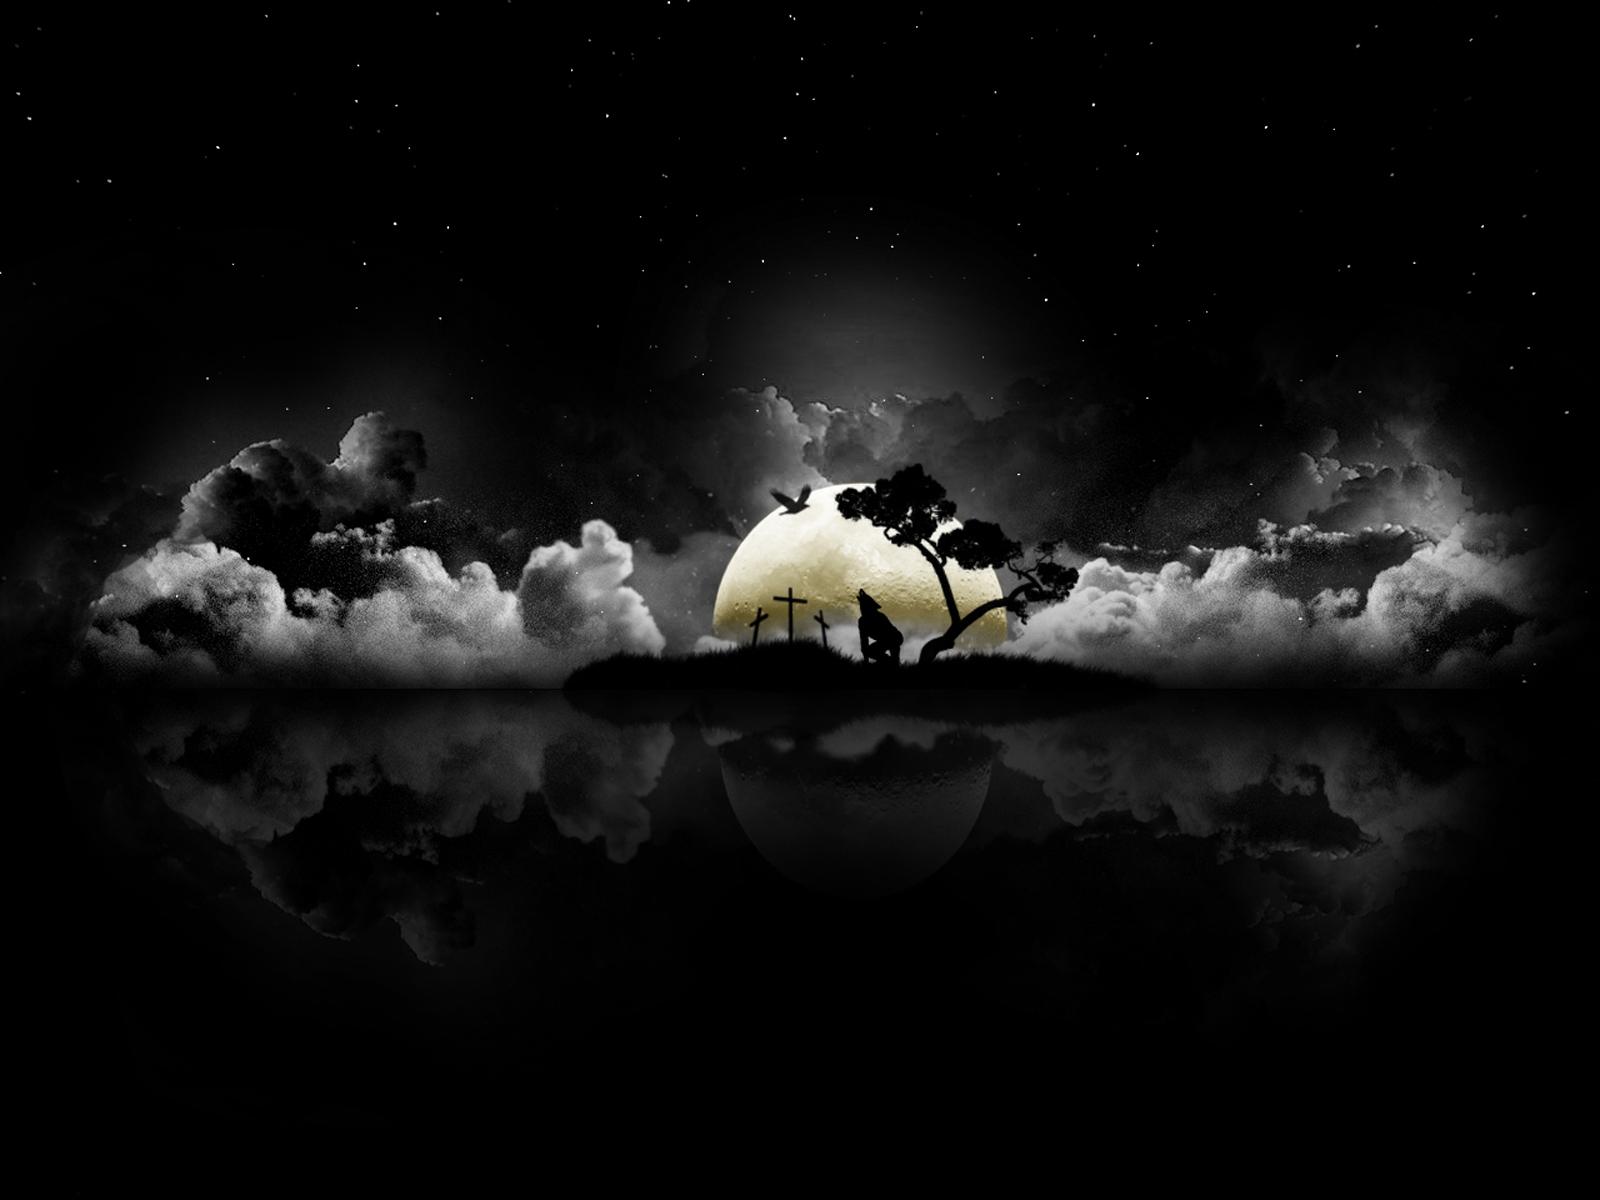 http://3.bp.blogspot.com/-PNjqLAq4vCs/TaKu-RT9wRI/AAAAAAAADRs/P-yr2z7RASc/s1600/Wallcate.com+-+Best+3D+Dark+Night+Wallpaper+%25287%2529.JPG